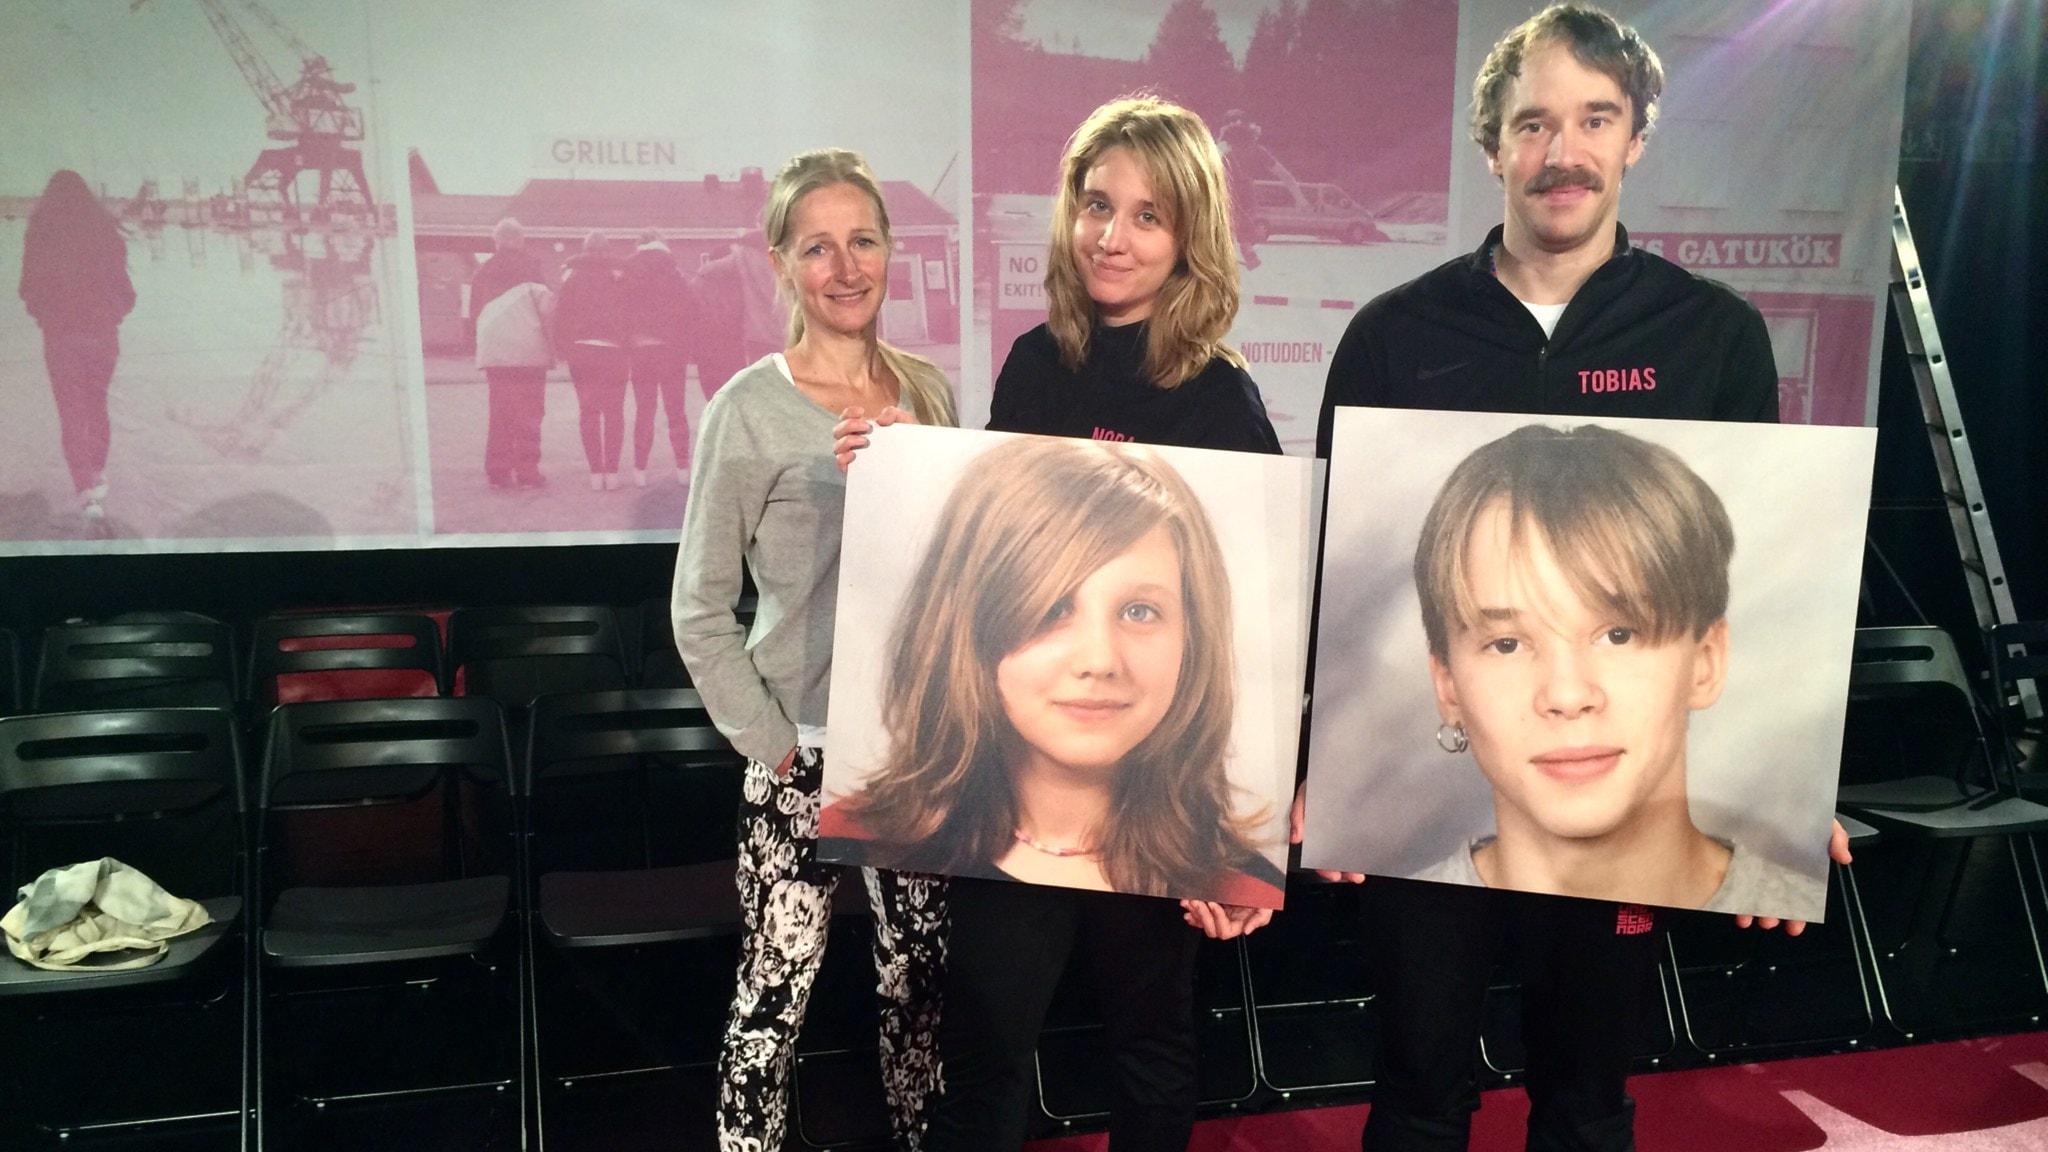 Mervi Jaako ja skoodikset Nora Bredefelt ja Tobias Sondén